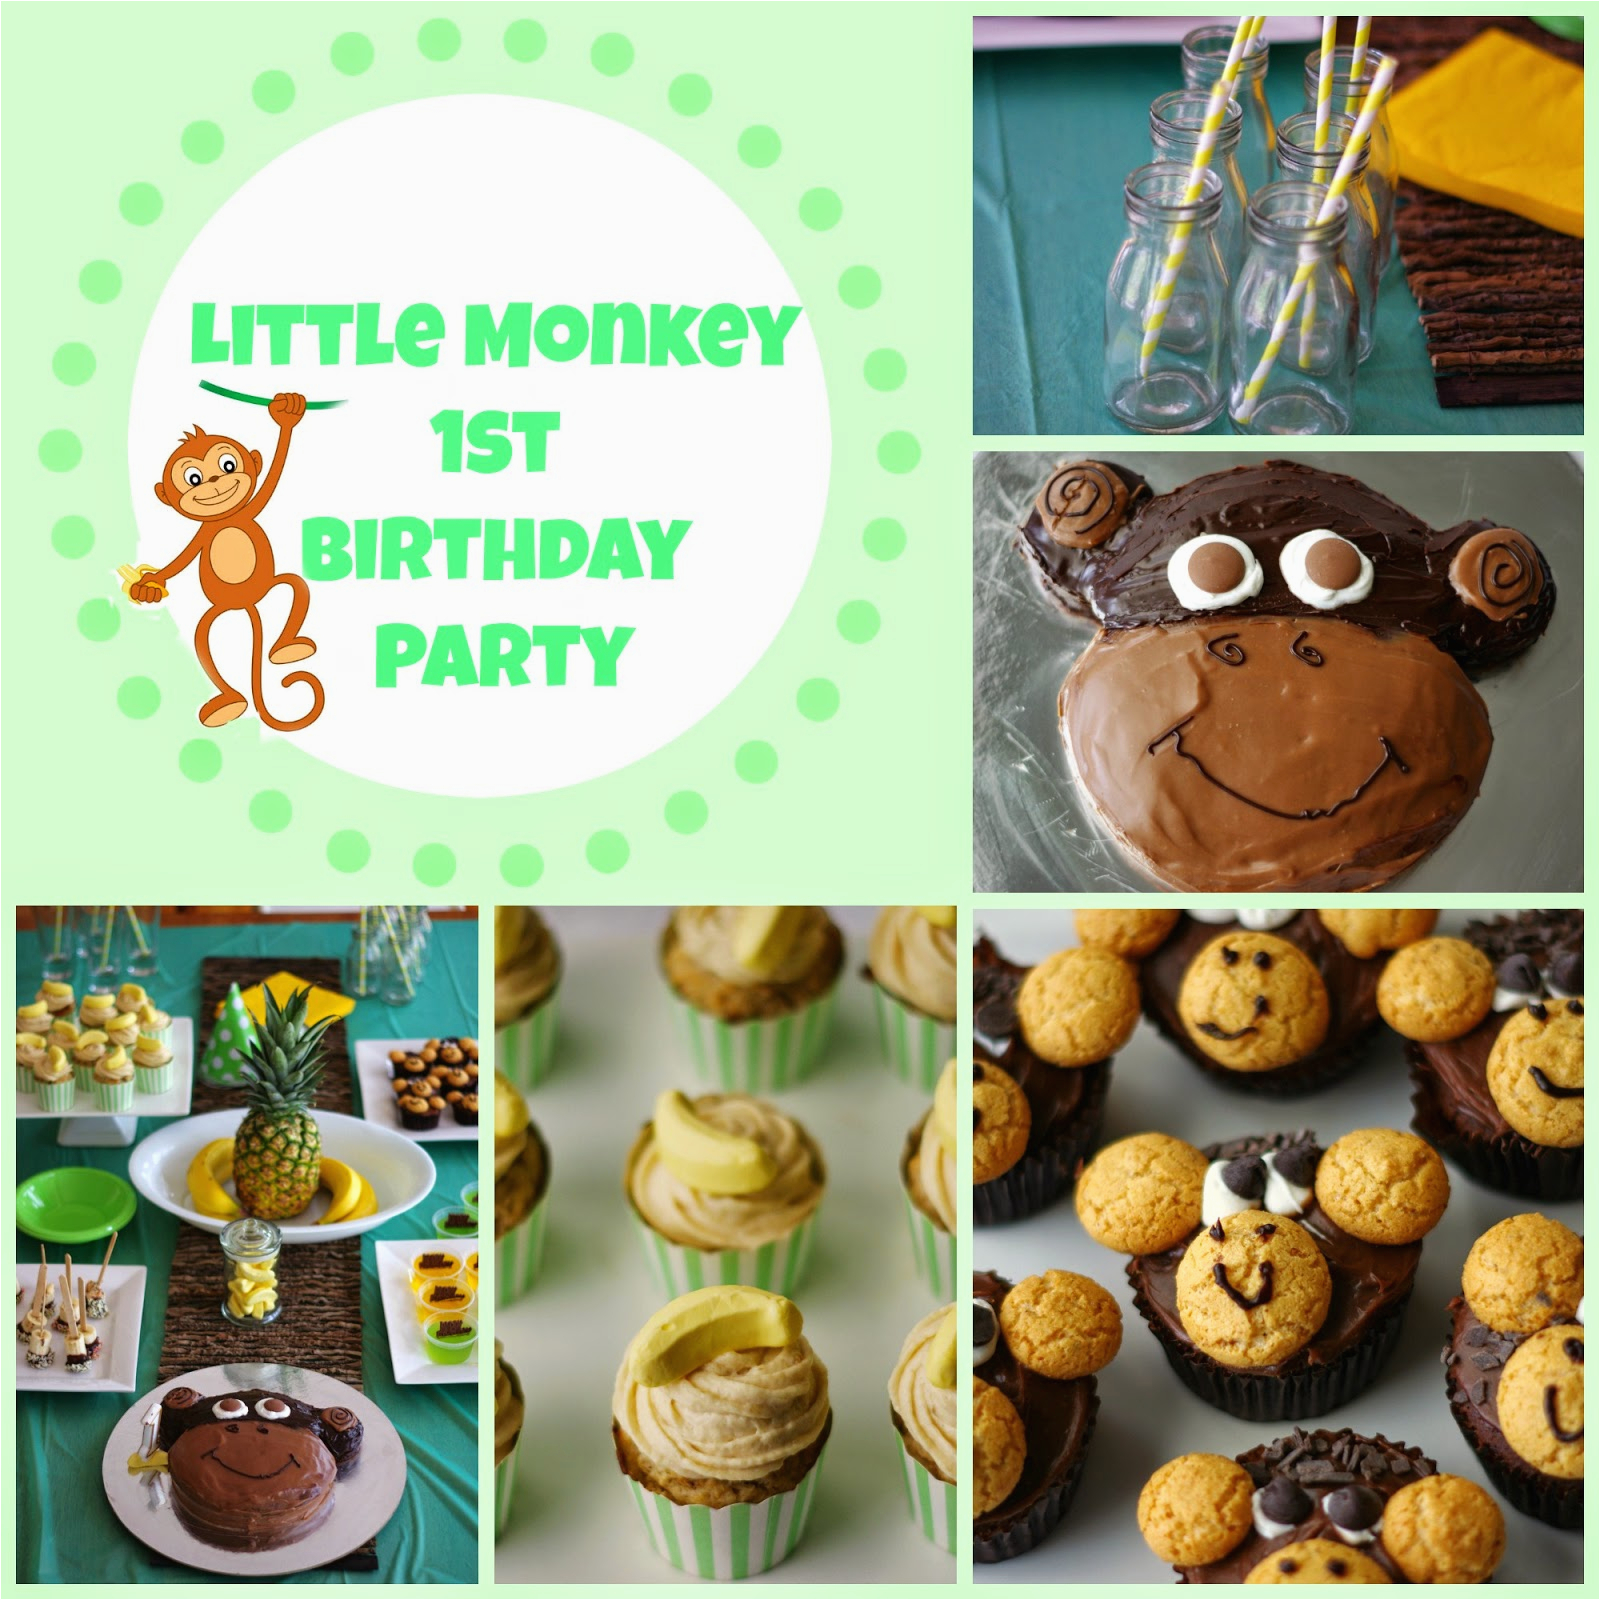 little monkey 1st birthday party